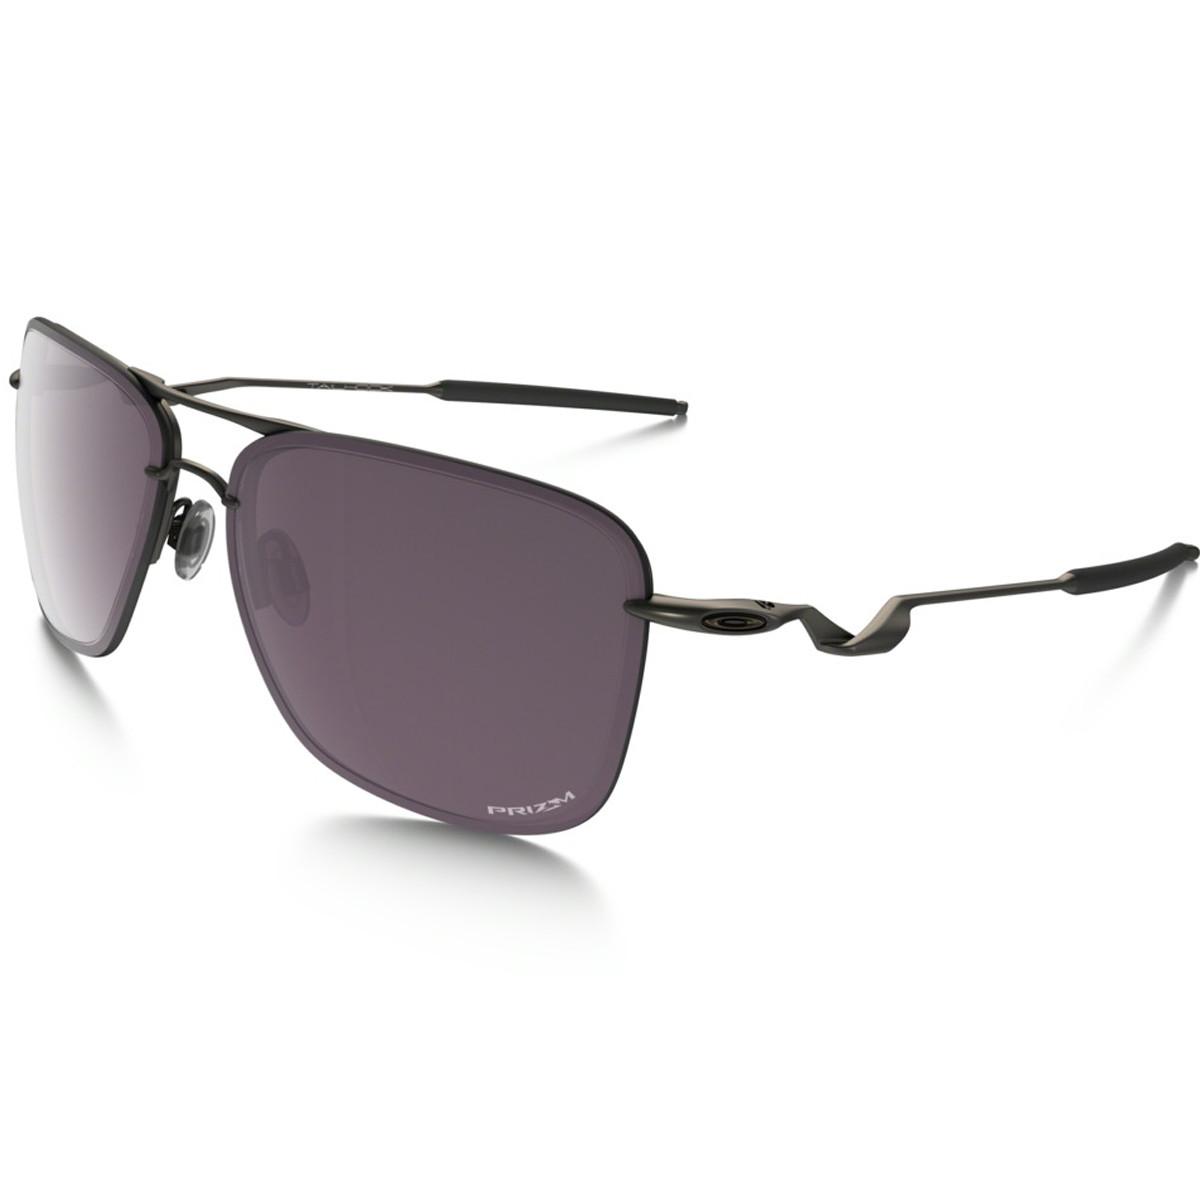 Óculos Oakley Tailhook Carbon Com Prizm Daily Polarizdo ref OO4087-05 0838b8f87c